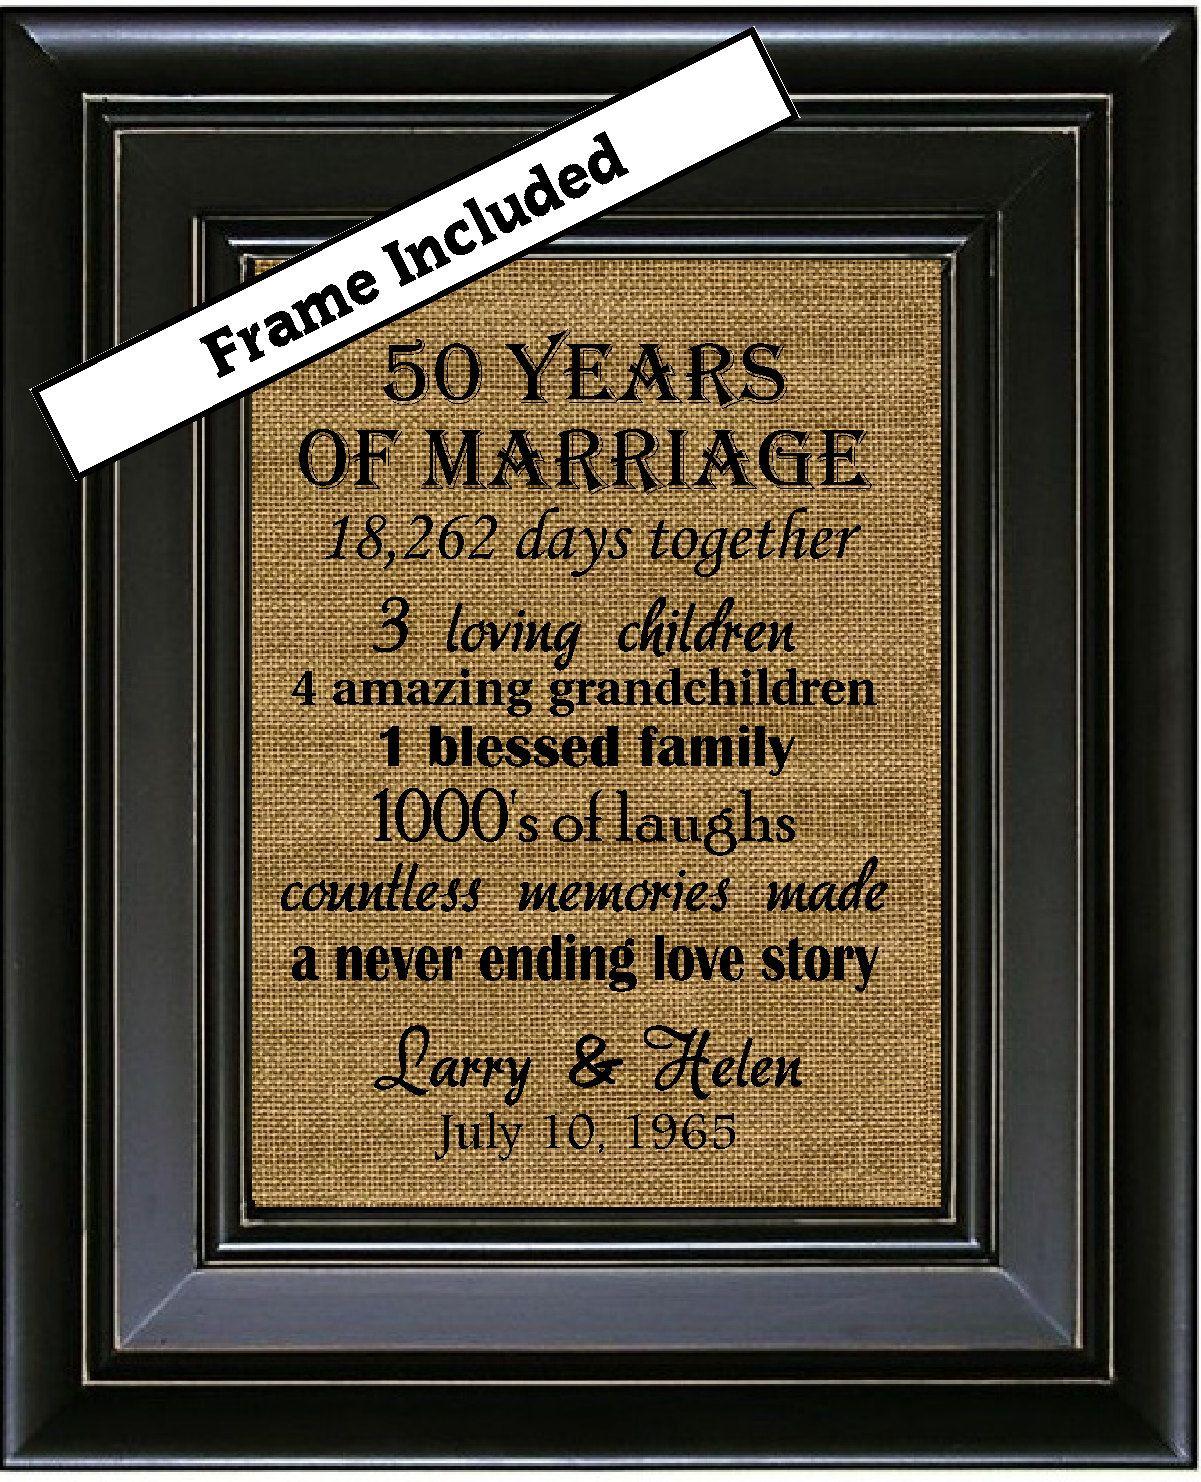 Ideas For A 50th Wedding Anniversary Gift: Wedding Anniversary Monogram 50 - Google Search